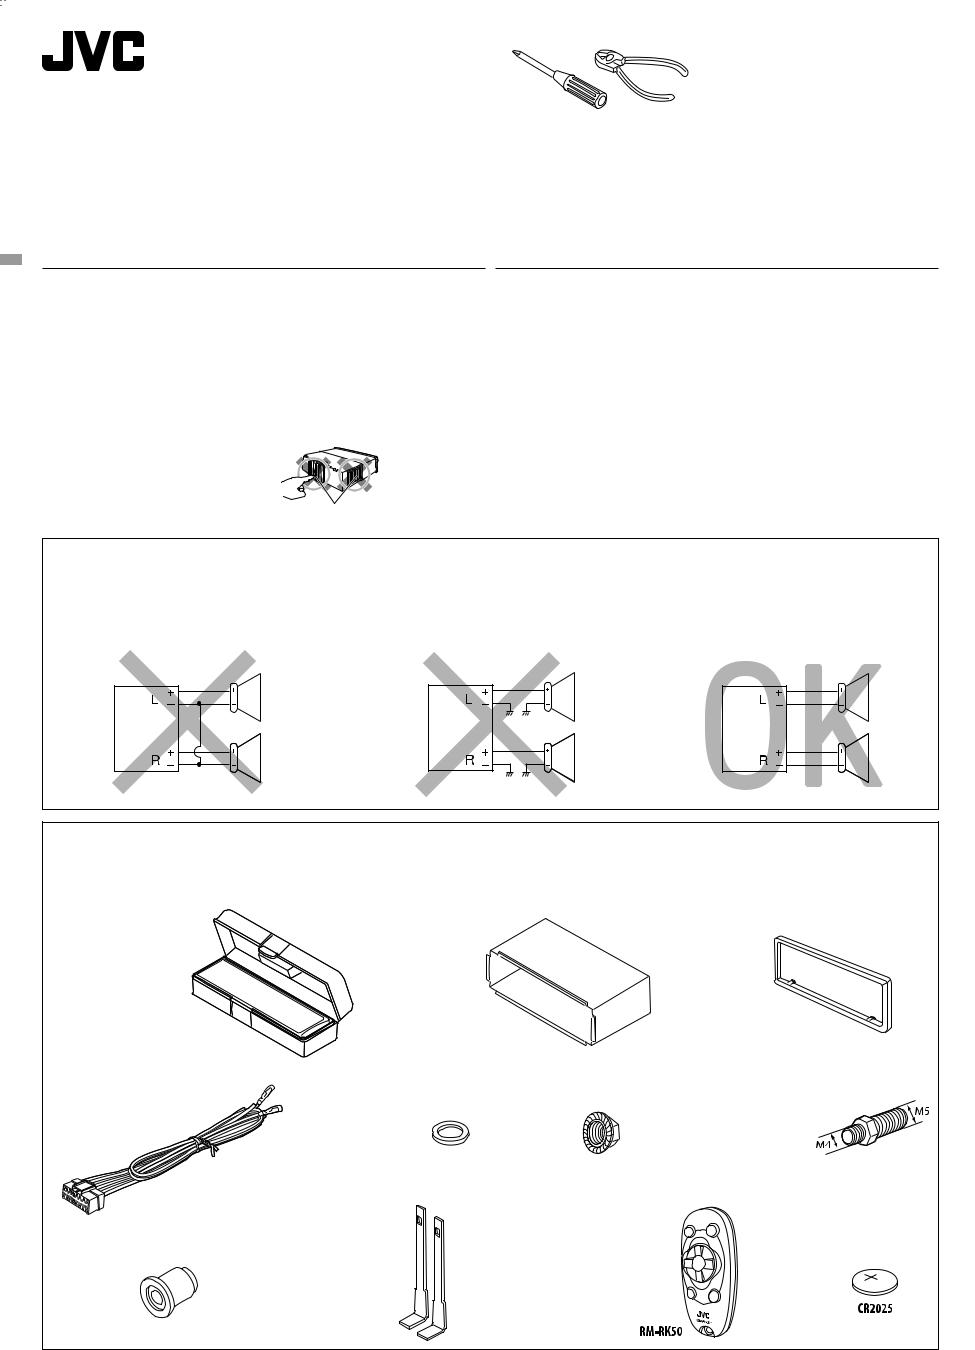 JVC KD-G645, KD-G646 User Manual on jvc speaker, jvc kd r330 wiring, standard car stereo wire diagram, jvc wiring harness, jvc dvd car stereo wiring, jvc harness diagram, jvc kd r200 wire diagram, jvc user manual, sony stereo wire harness diagram, jvc kd s29 wiring,